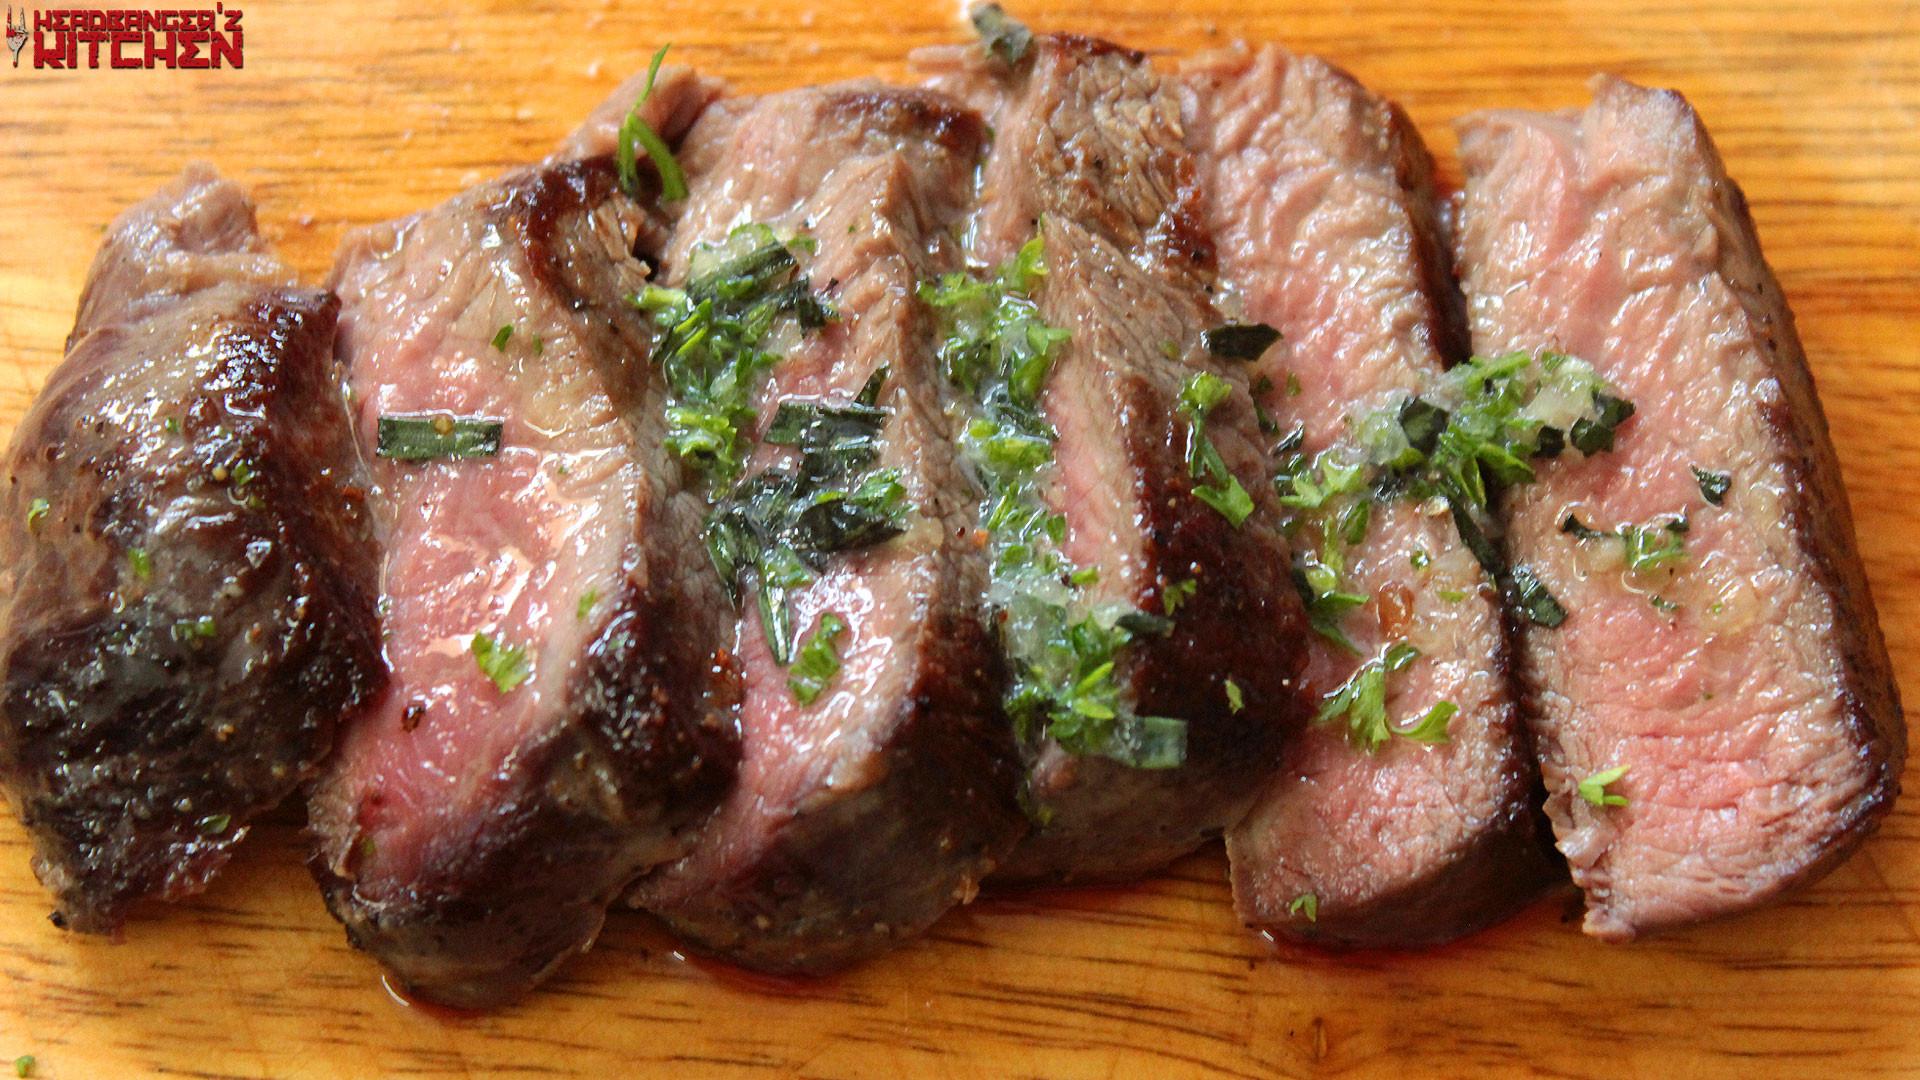 Keto Dinner Recipes Beef Steak  Keto Beef Steak with Herbed Butter Headbanger s Kitchen